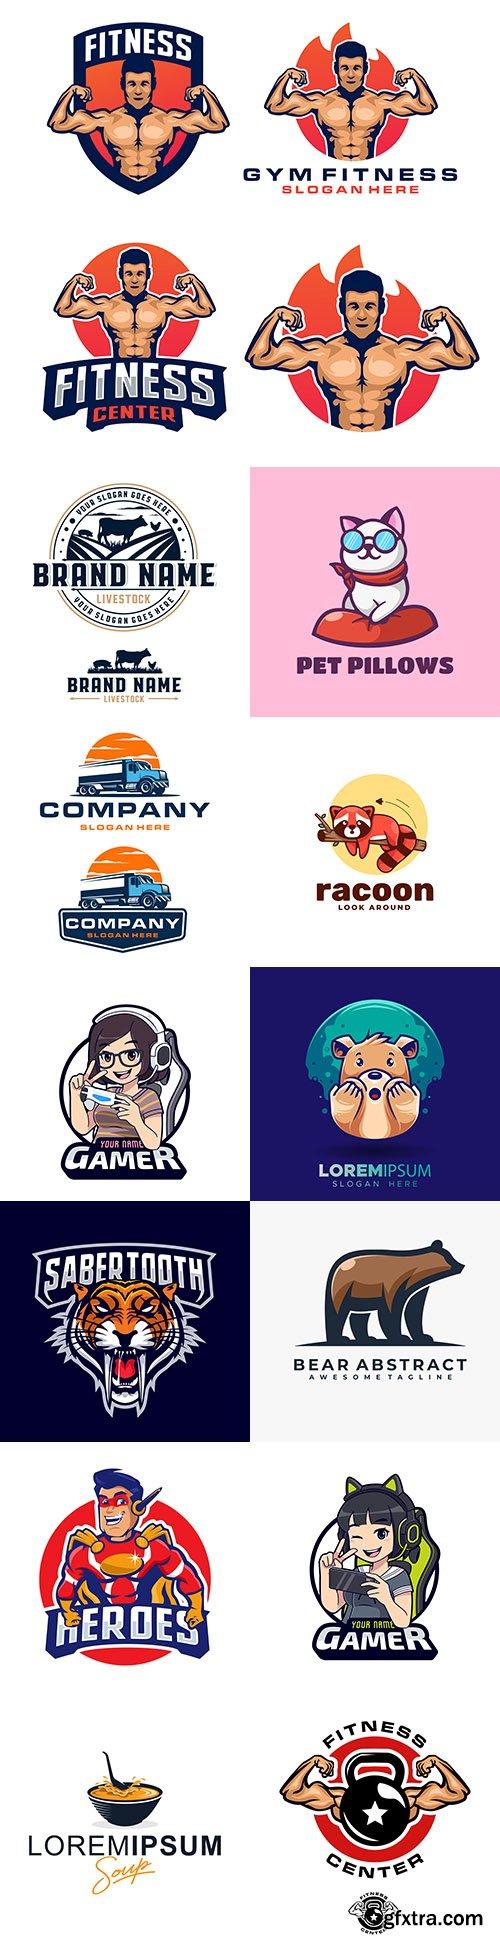 Brand name company logos business corporate design 67